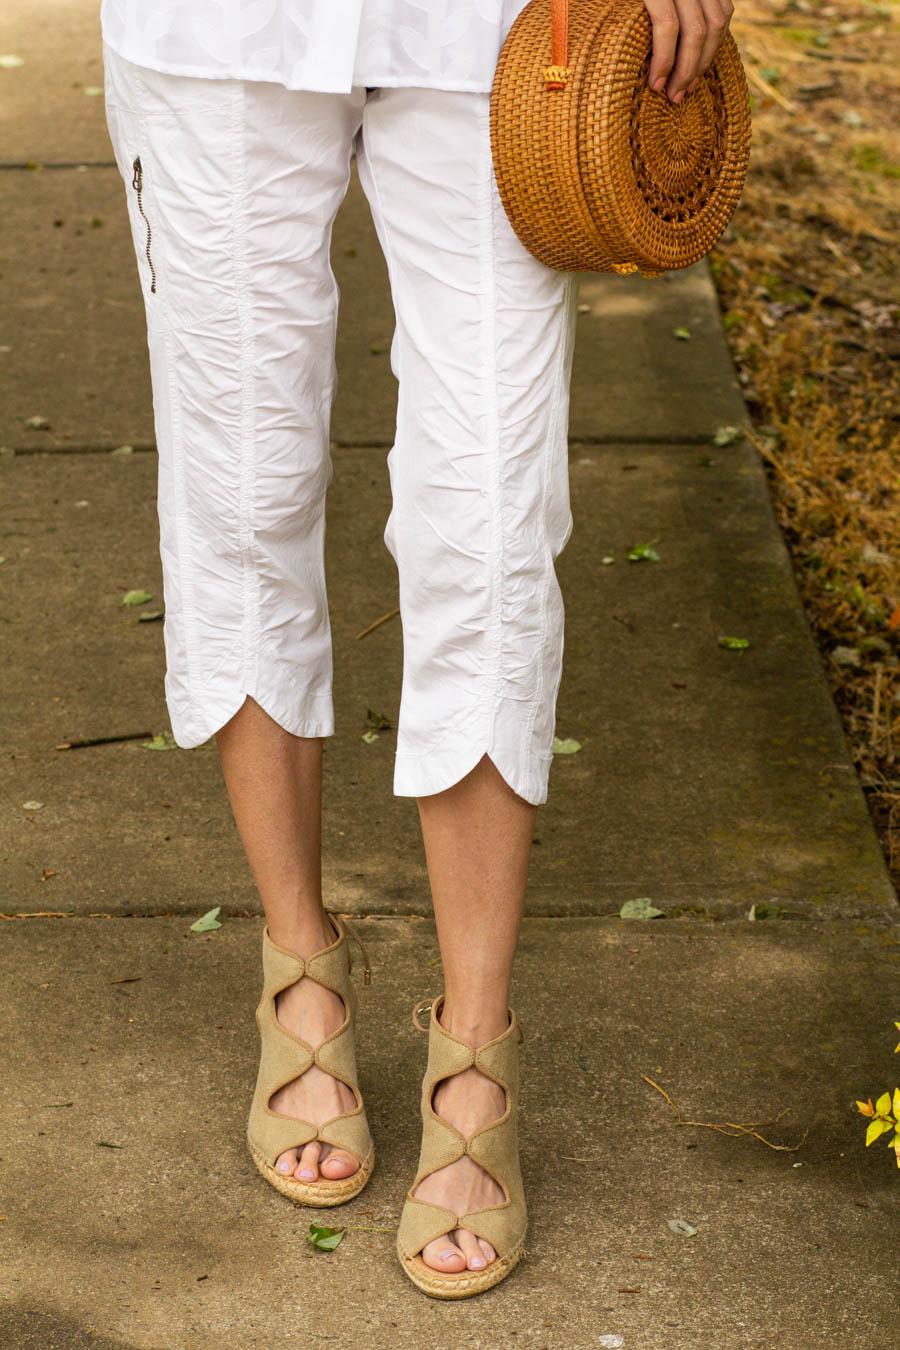 XCVI Iris cropped white pants with espadrilles